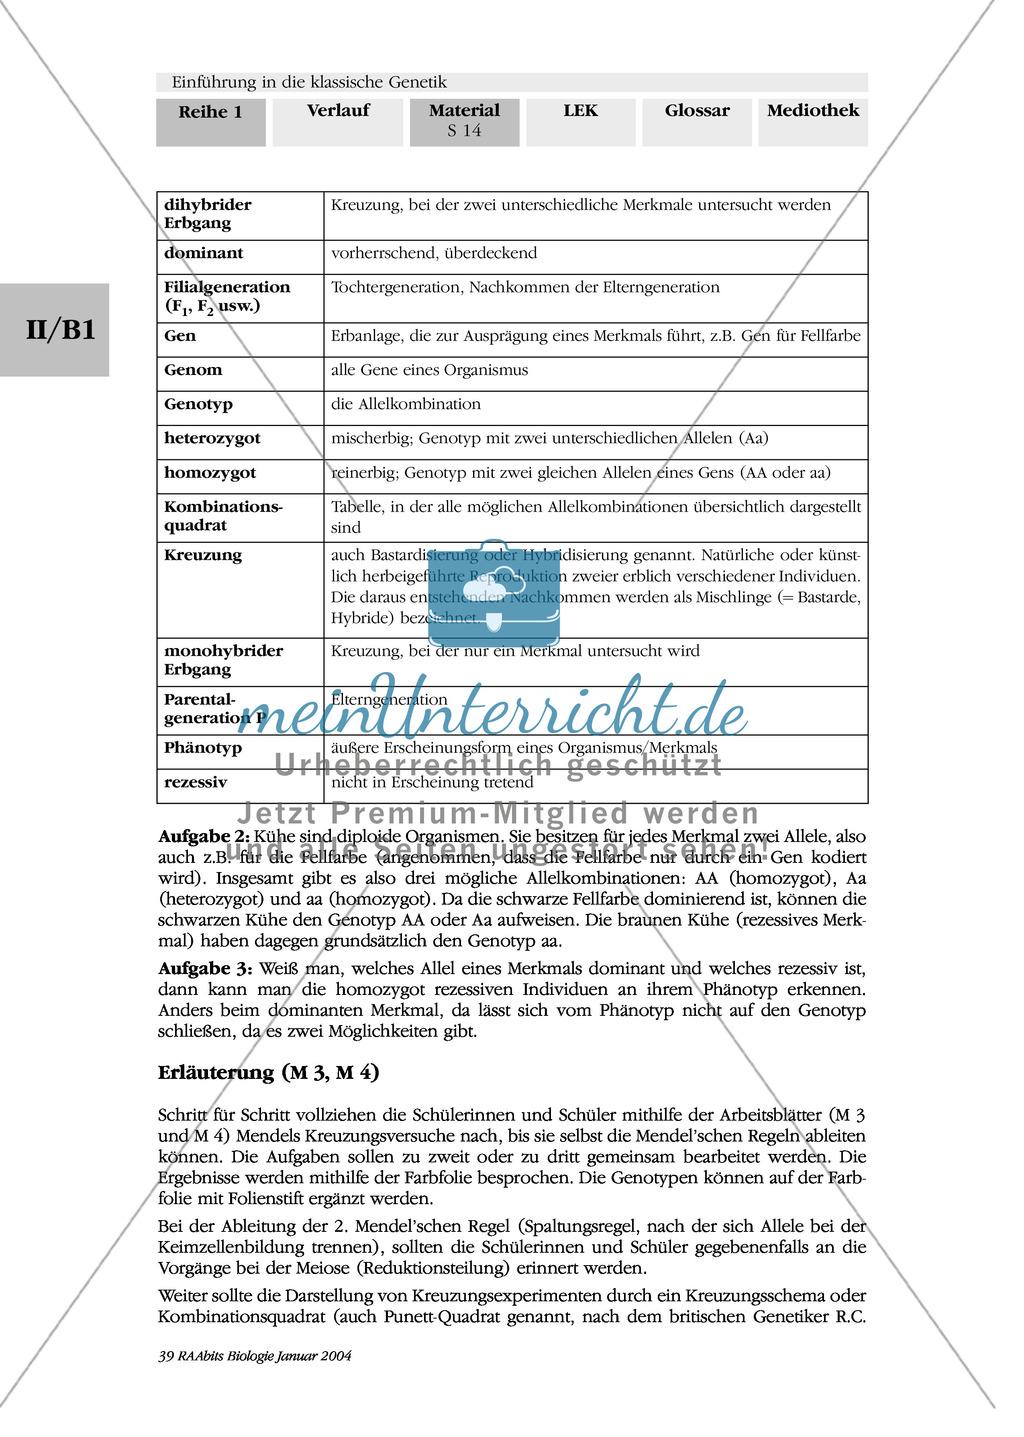 Klassische Genetik: Mendel`sche Regeln - Begriffe, Regeln, Kodominanz Preview 10